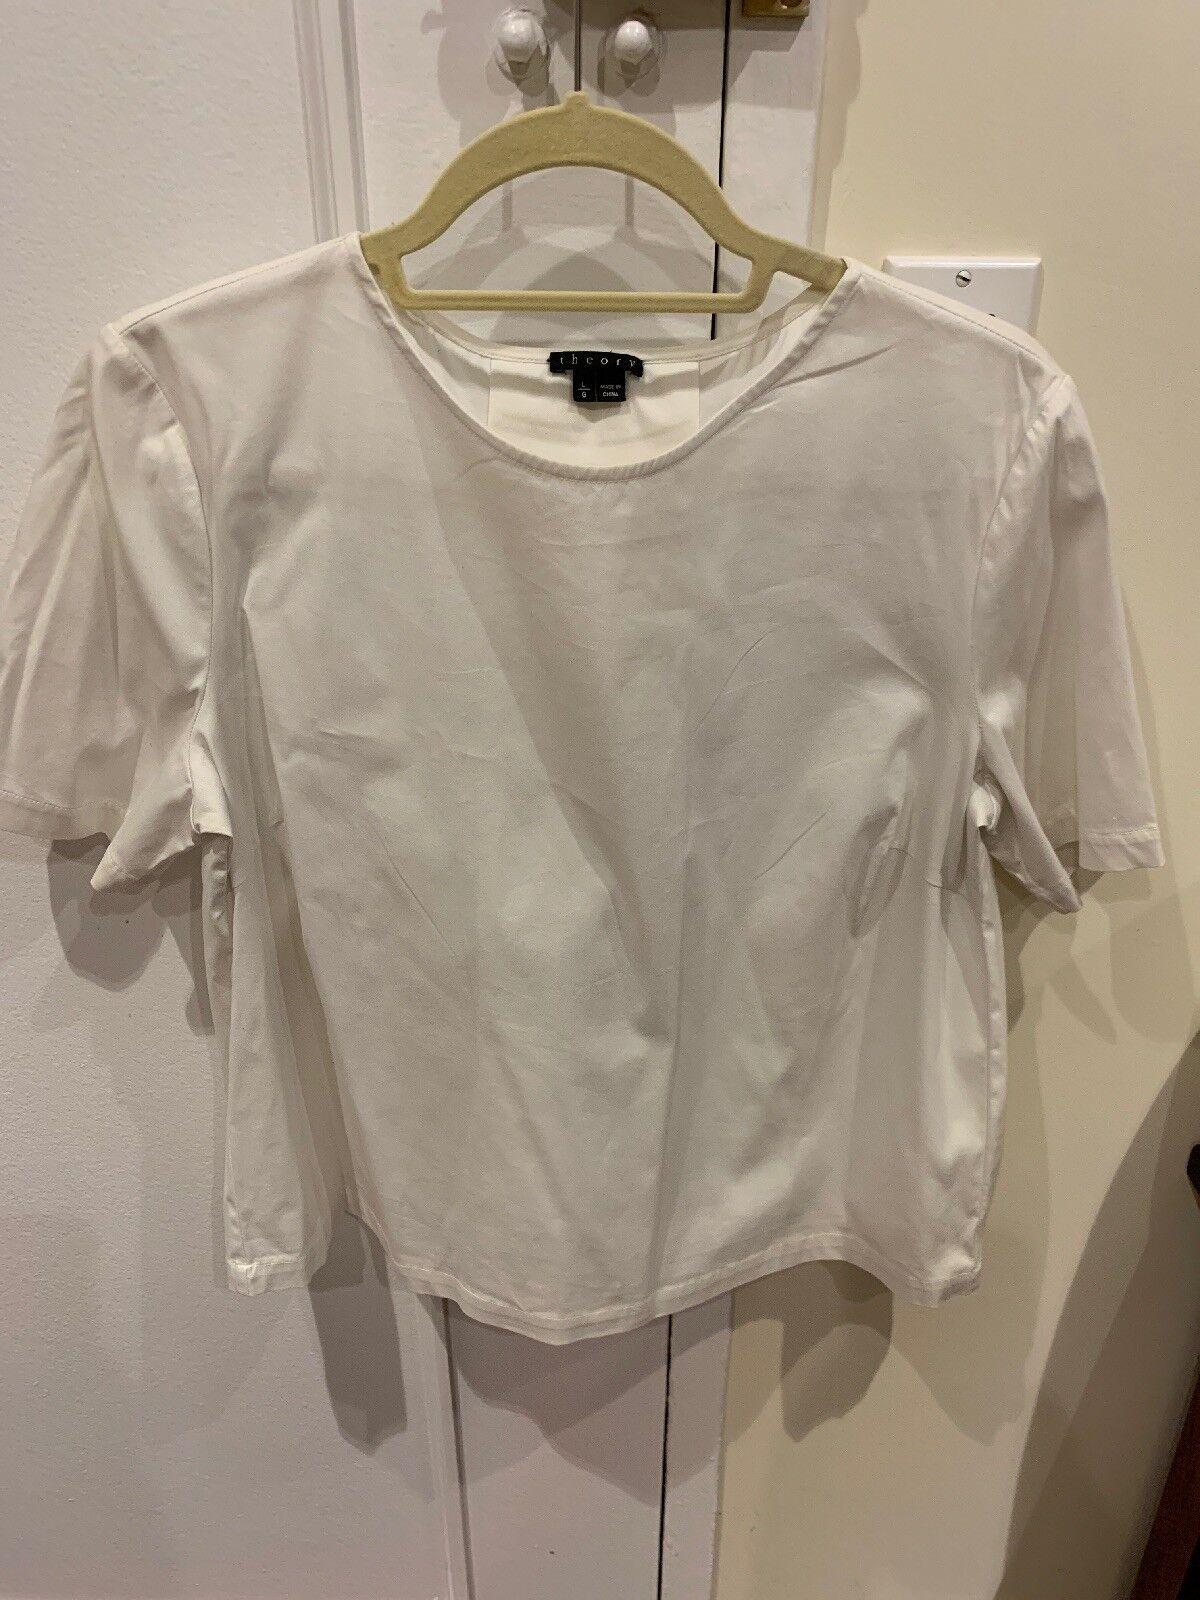 damen's Theory Weiß Short Sleeve Top, Größe Large